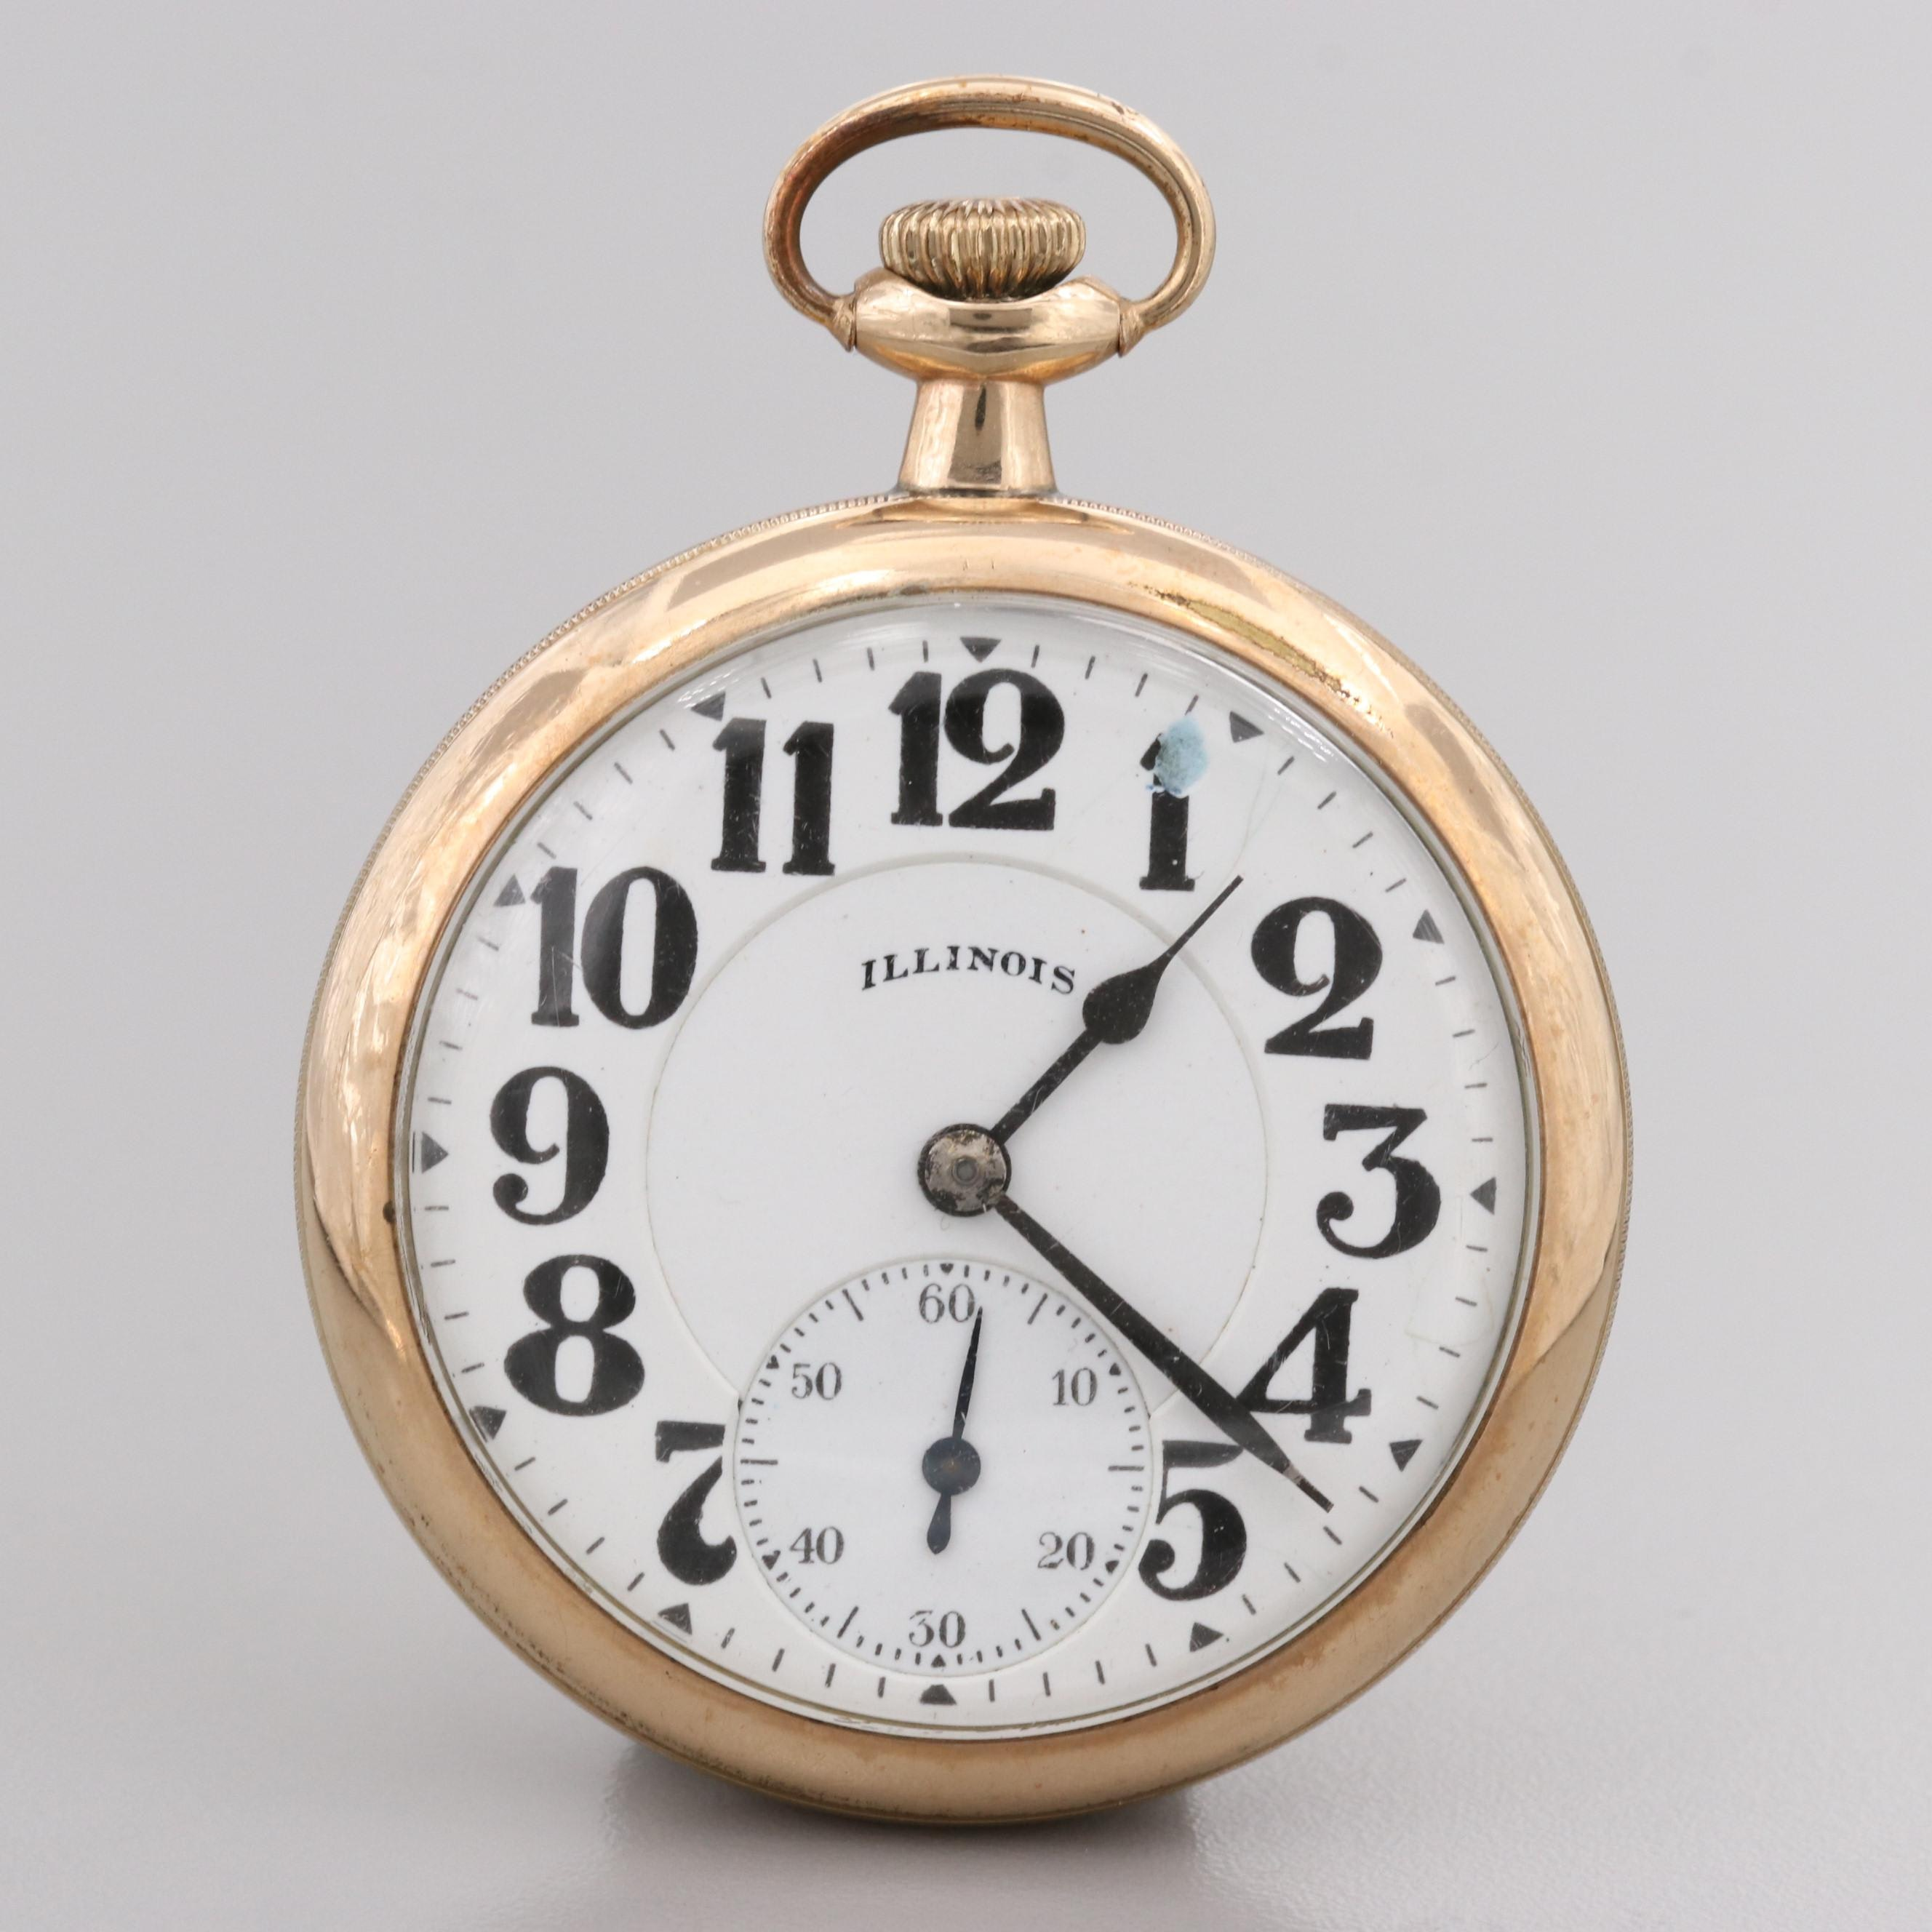 Illinois Bunn Special Pocket Watch, 1920